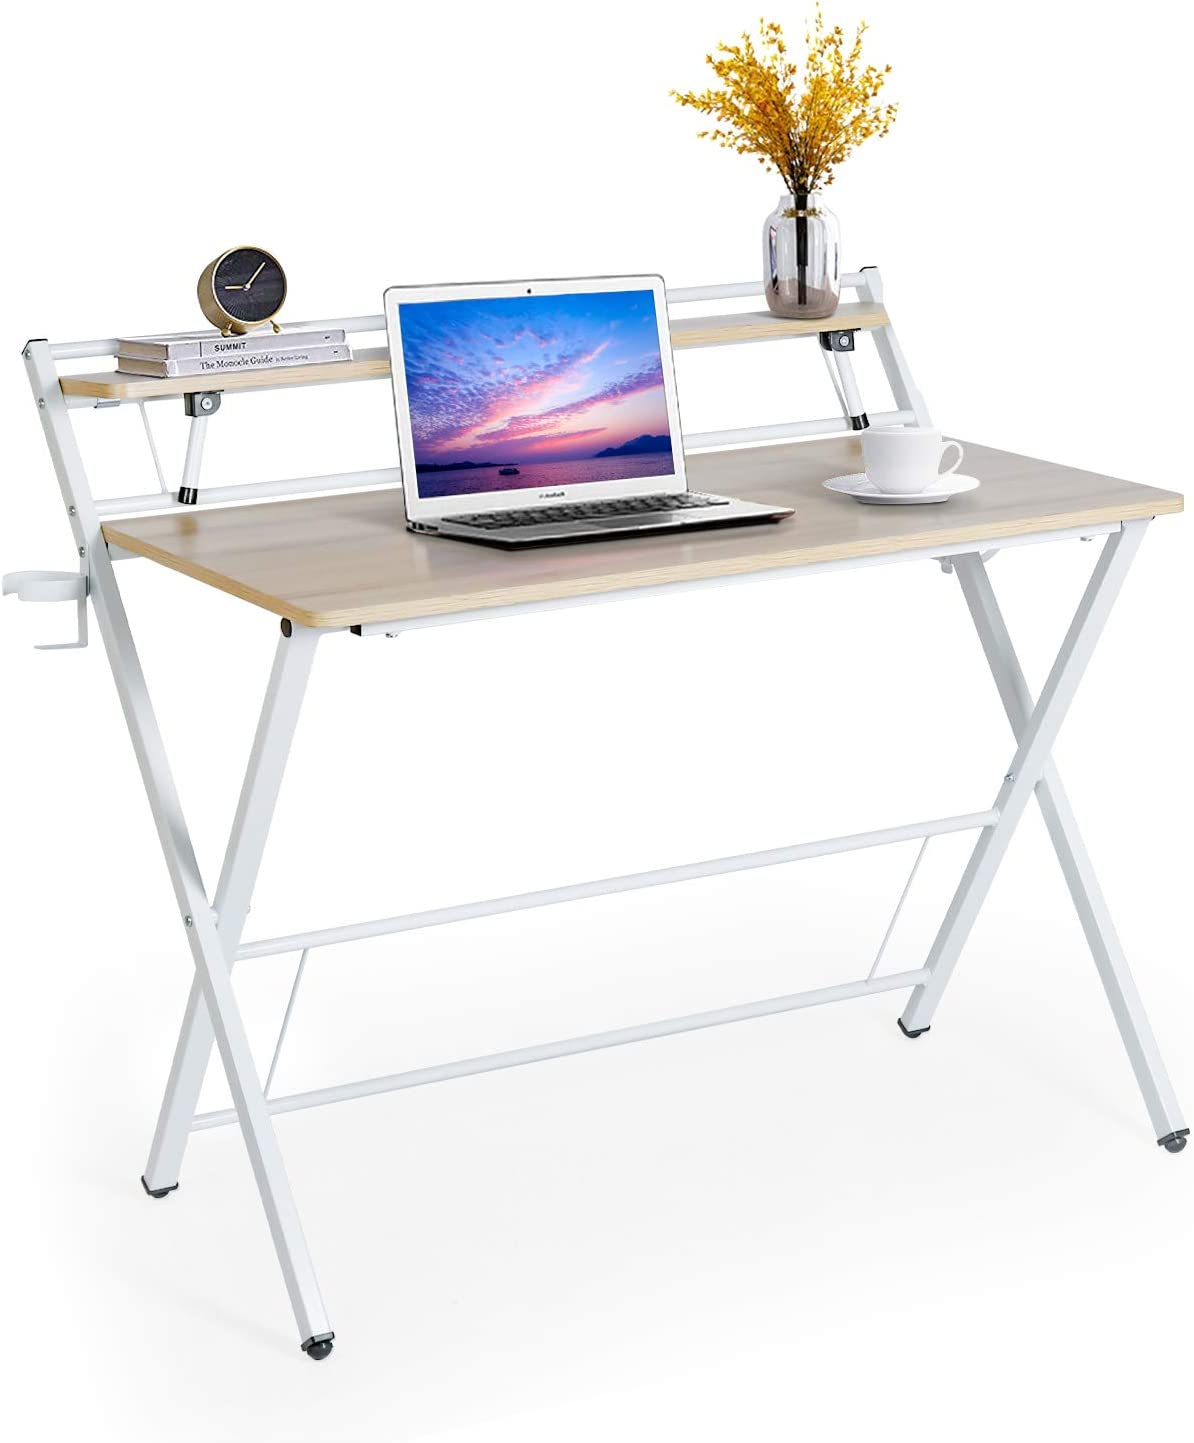 Computer Desk PC Laptop Table Workstation Study Home Office W// 2 Tier Shelves